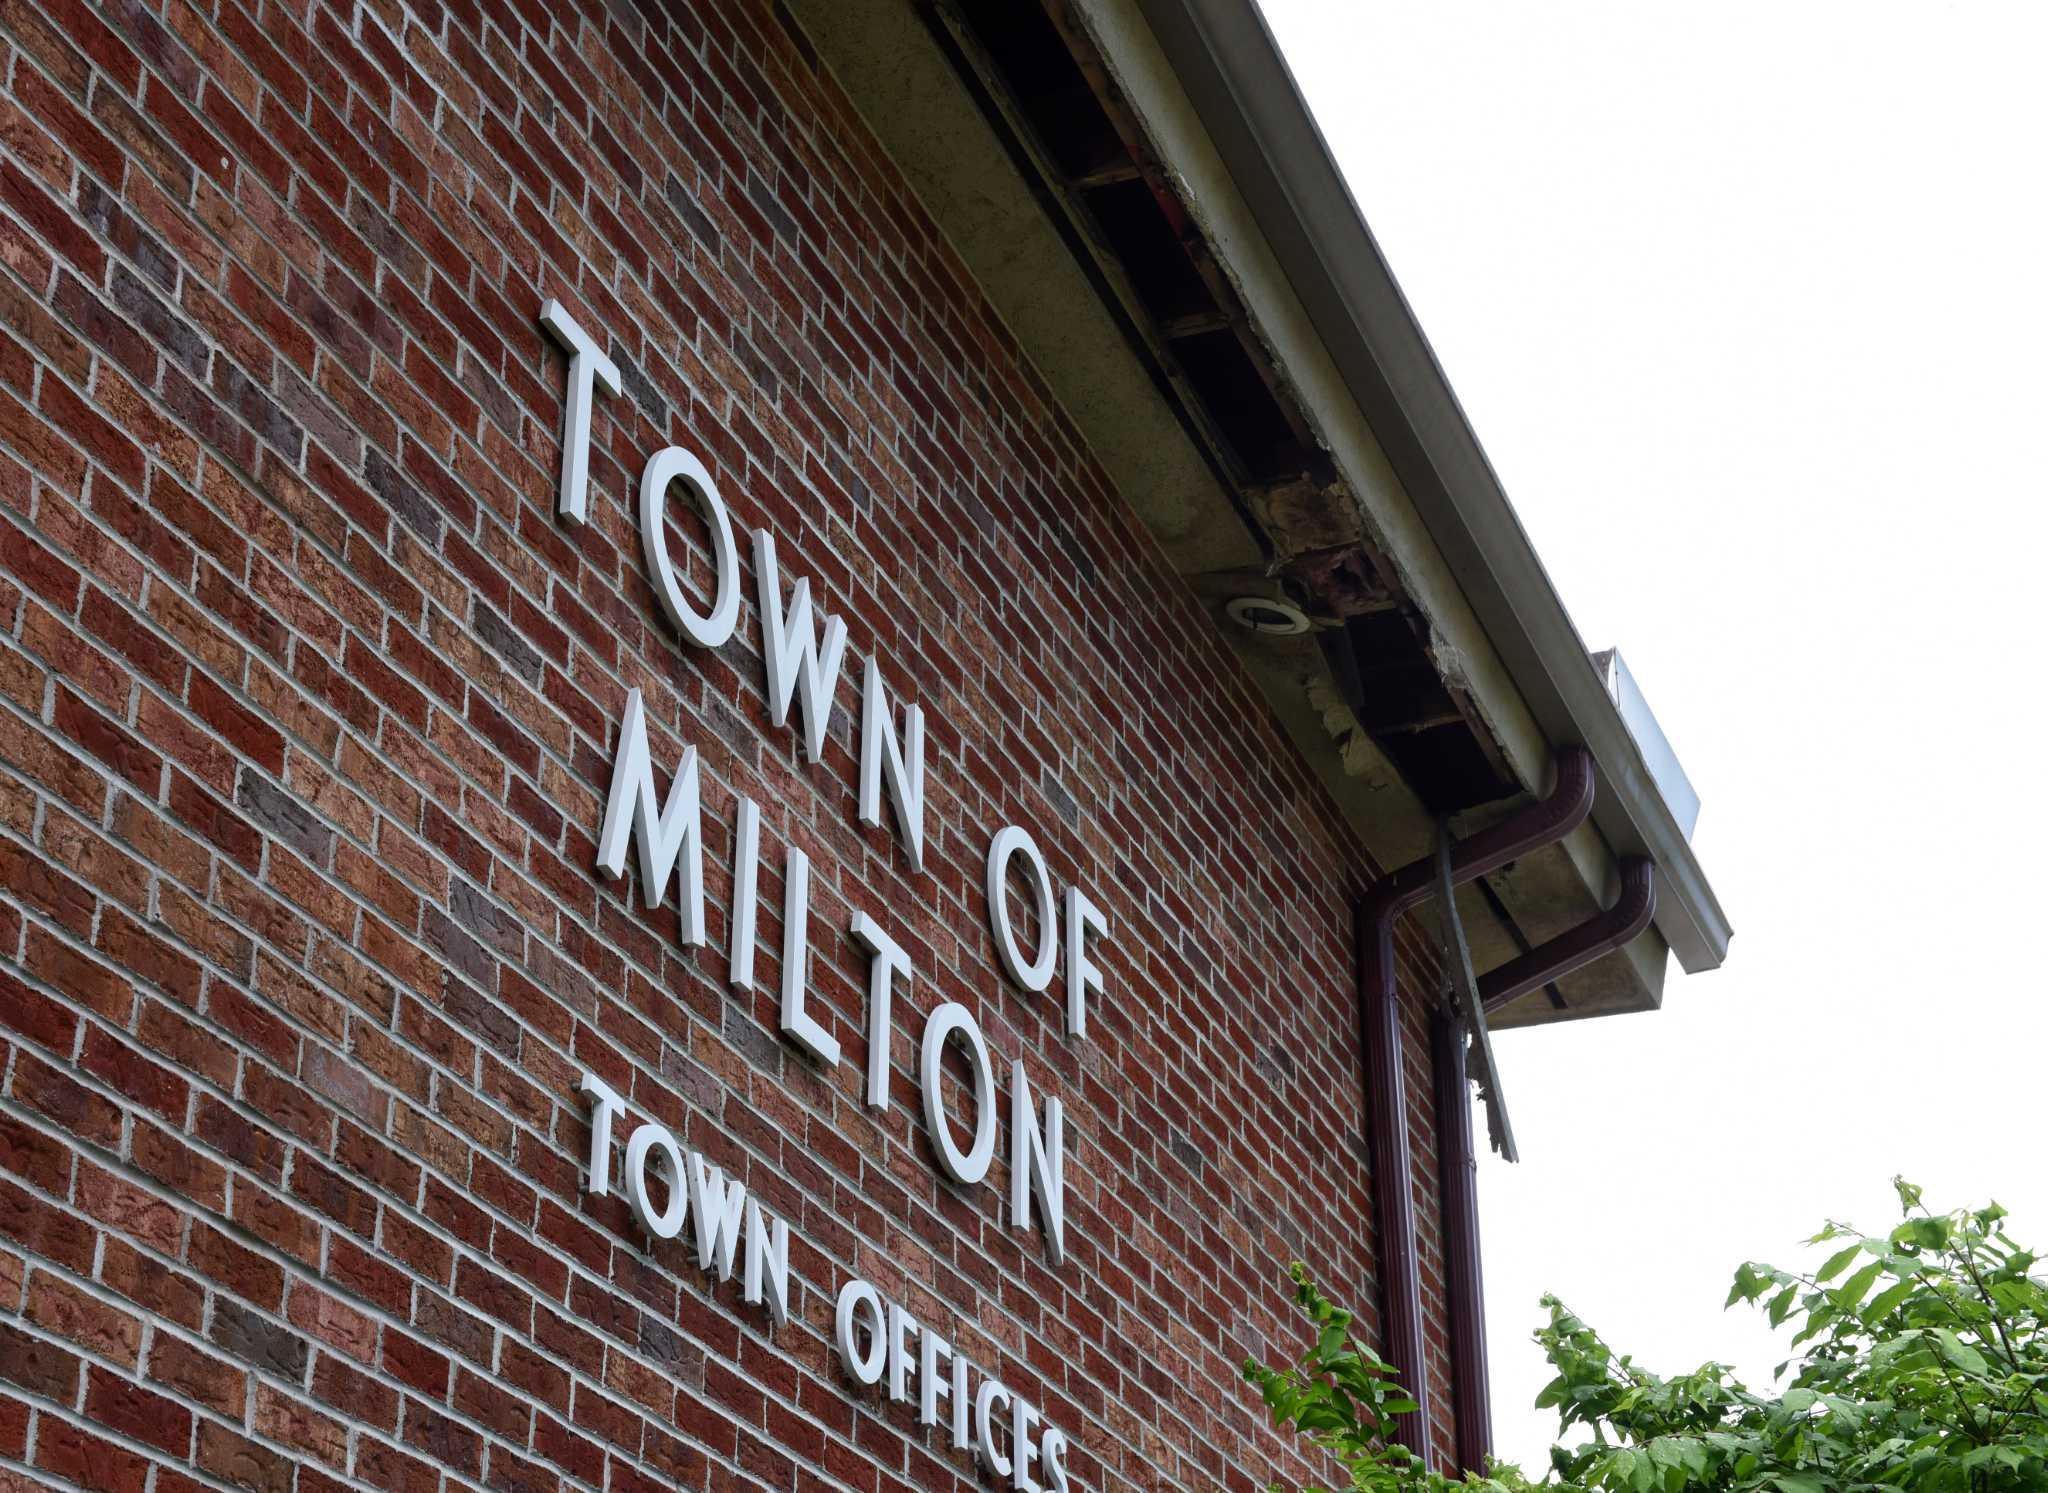 Despite Milton's woes, 3 people want top job